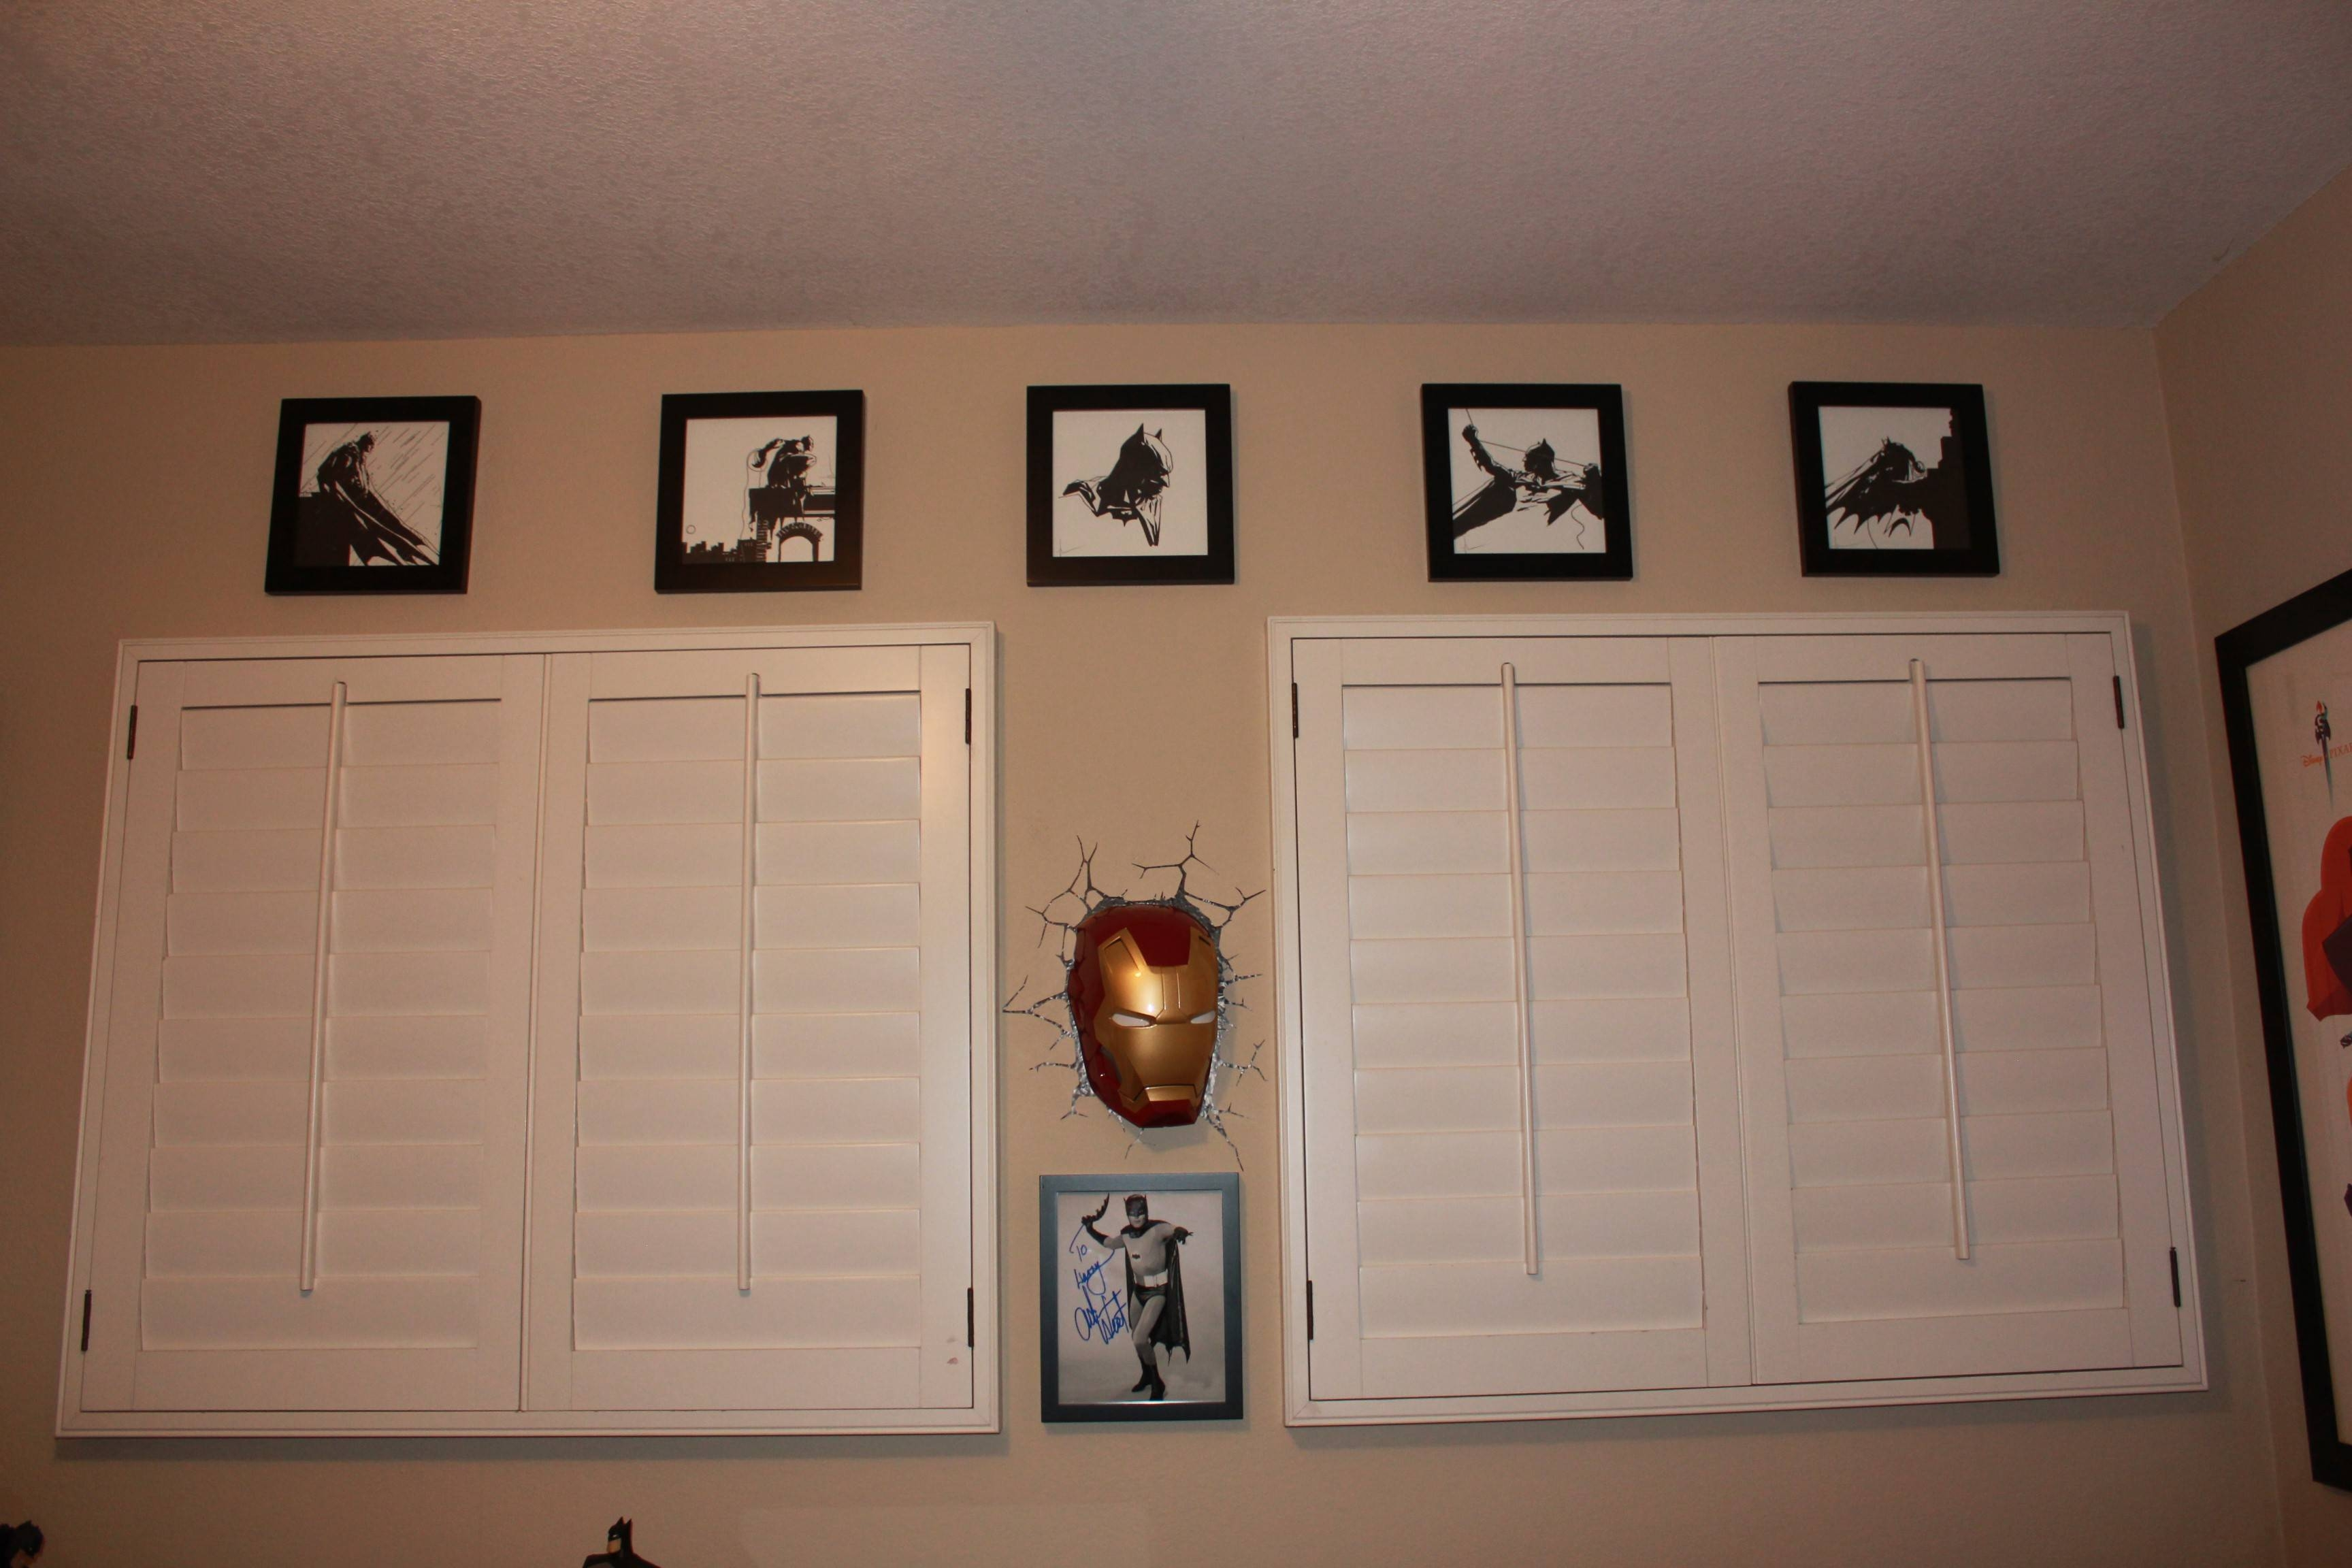 Iron Man Mask Wall Light #57268 | Astonbkk With Best And Newest Iron Man 3D Wall Art (View 15 of 20)